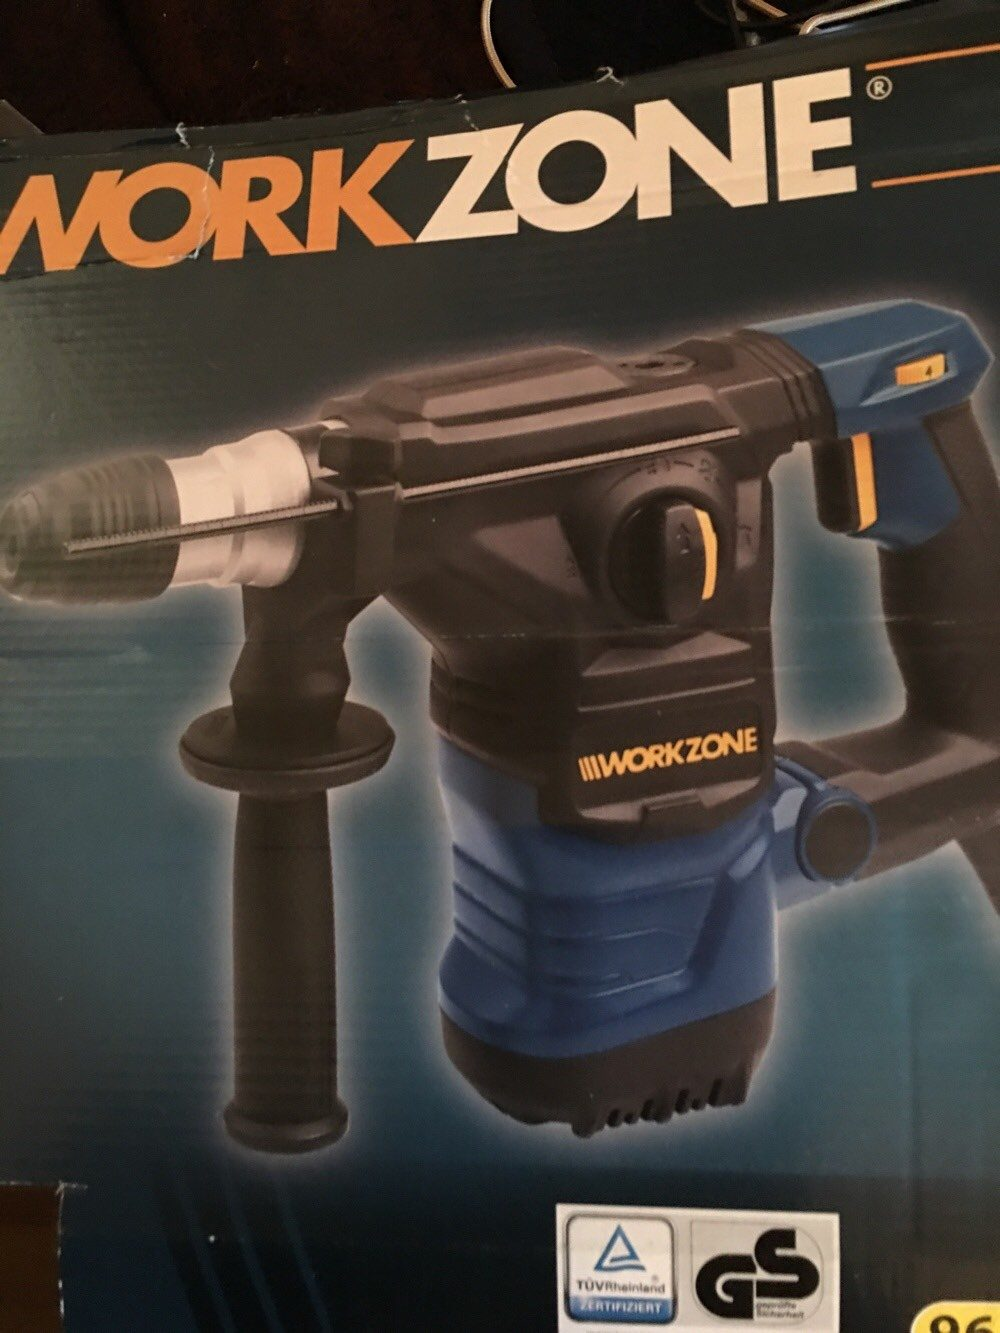 WorkZone - Bohrhammer - Produit